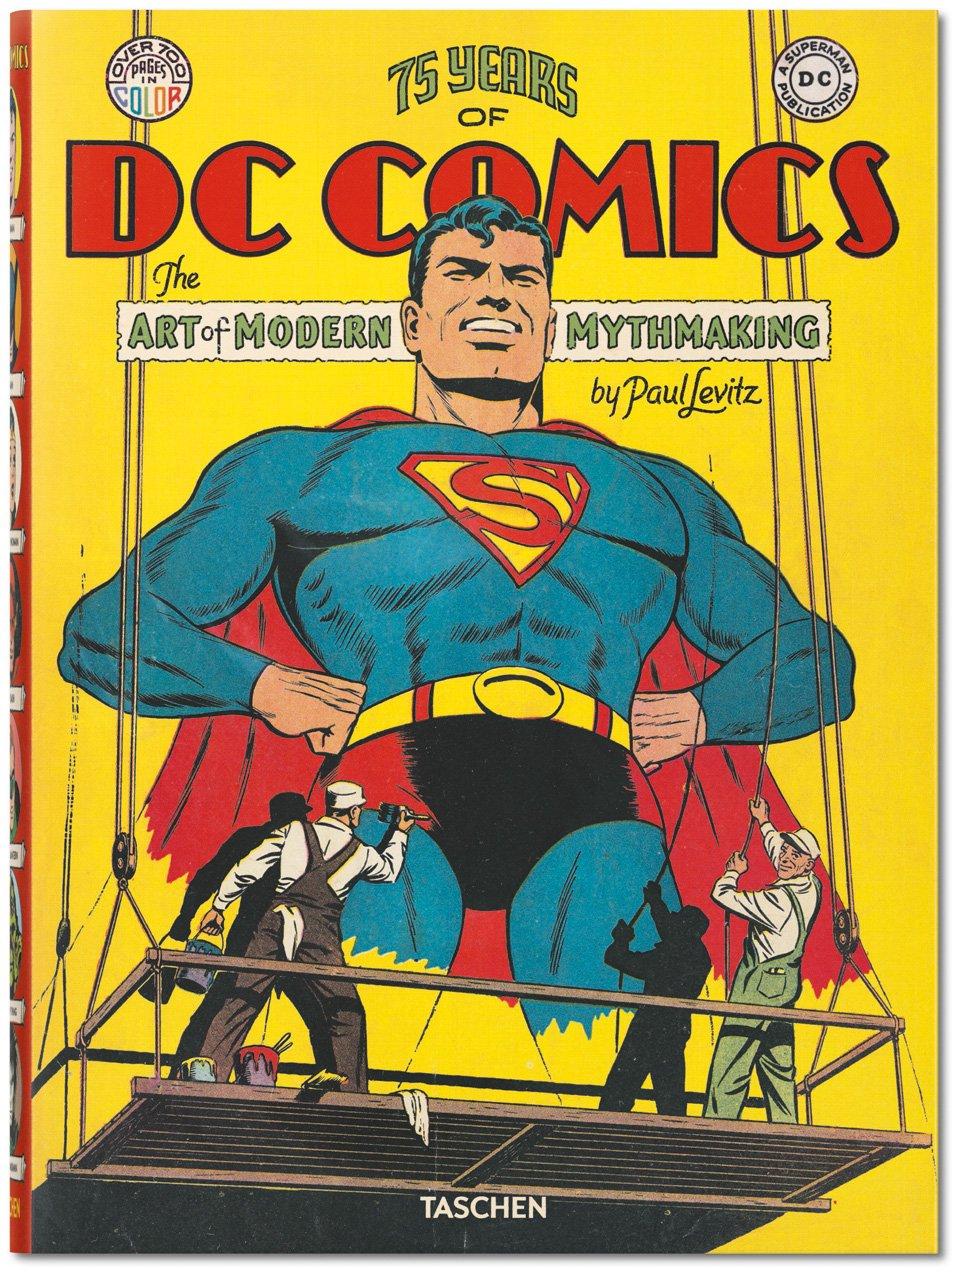 75_years_dc_comics_fp_gb_3d_04812_1703091950_id_1117787